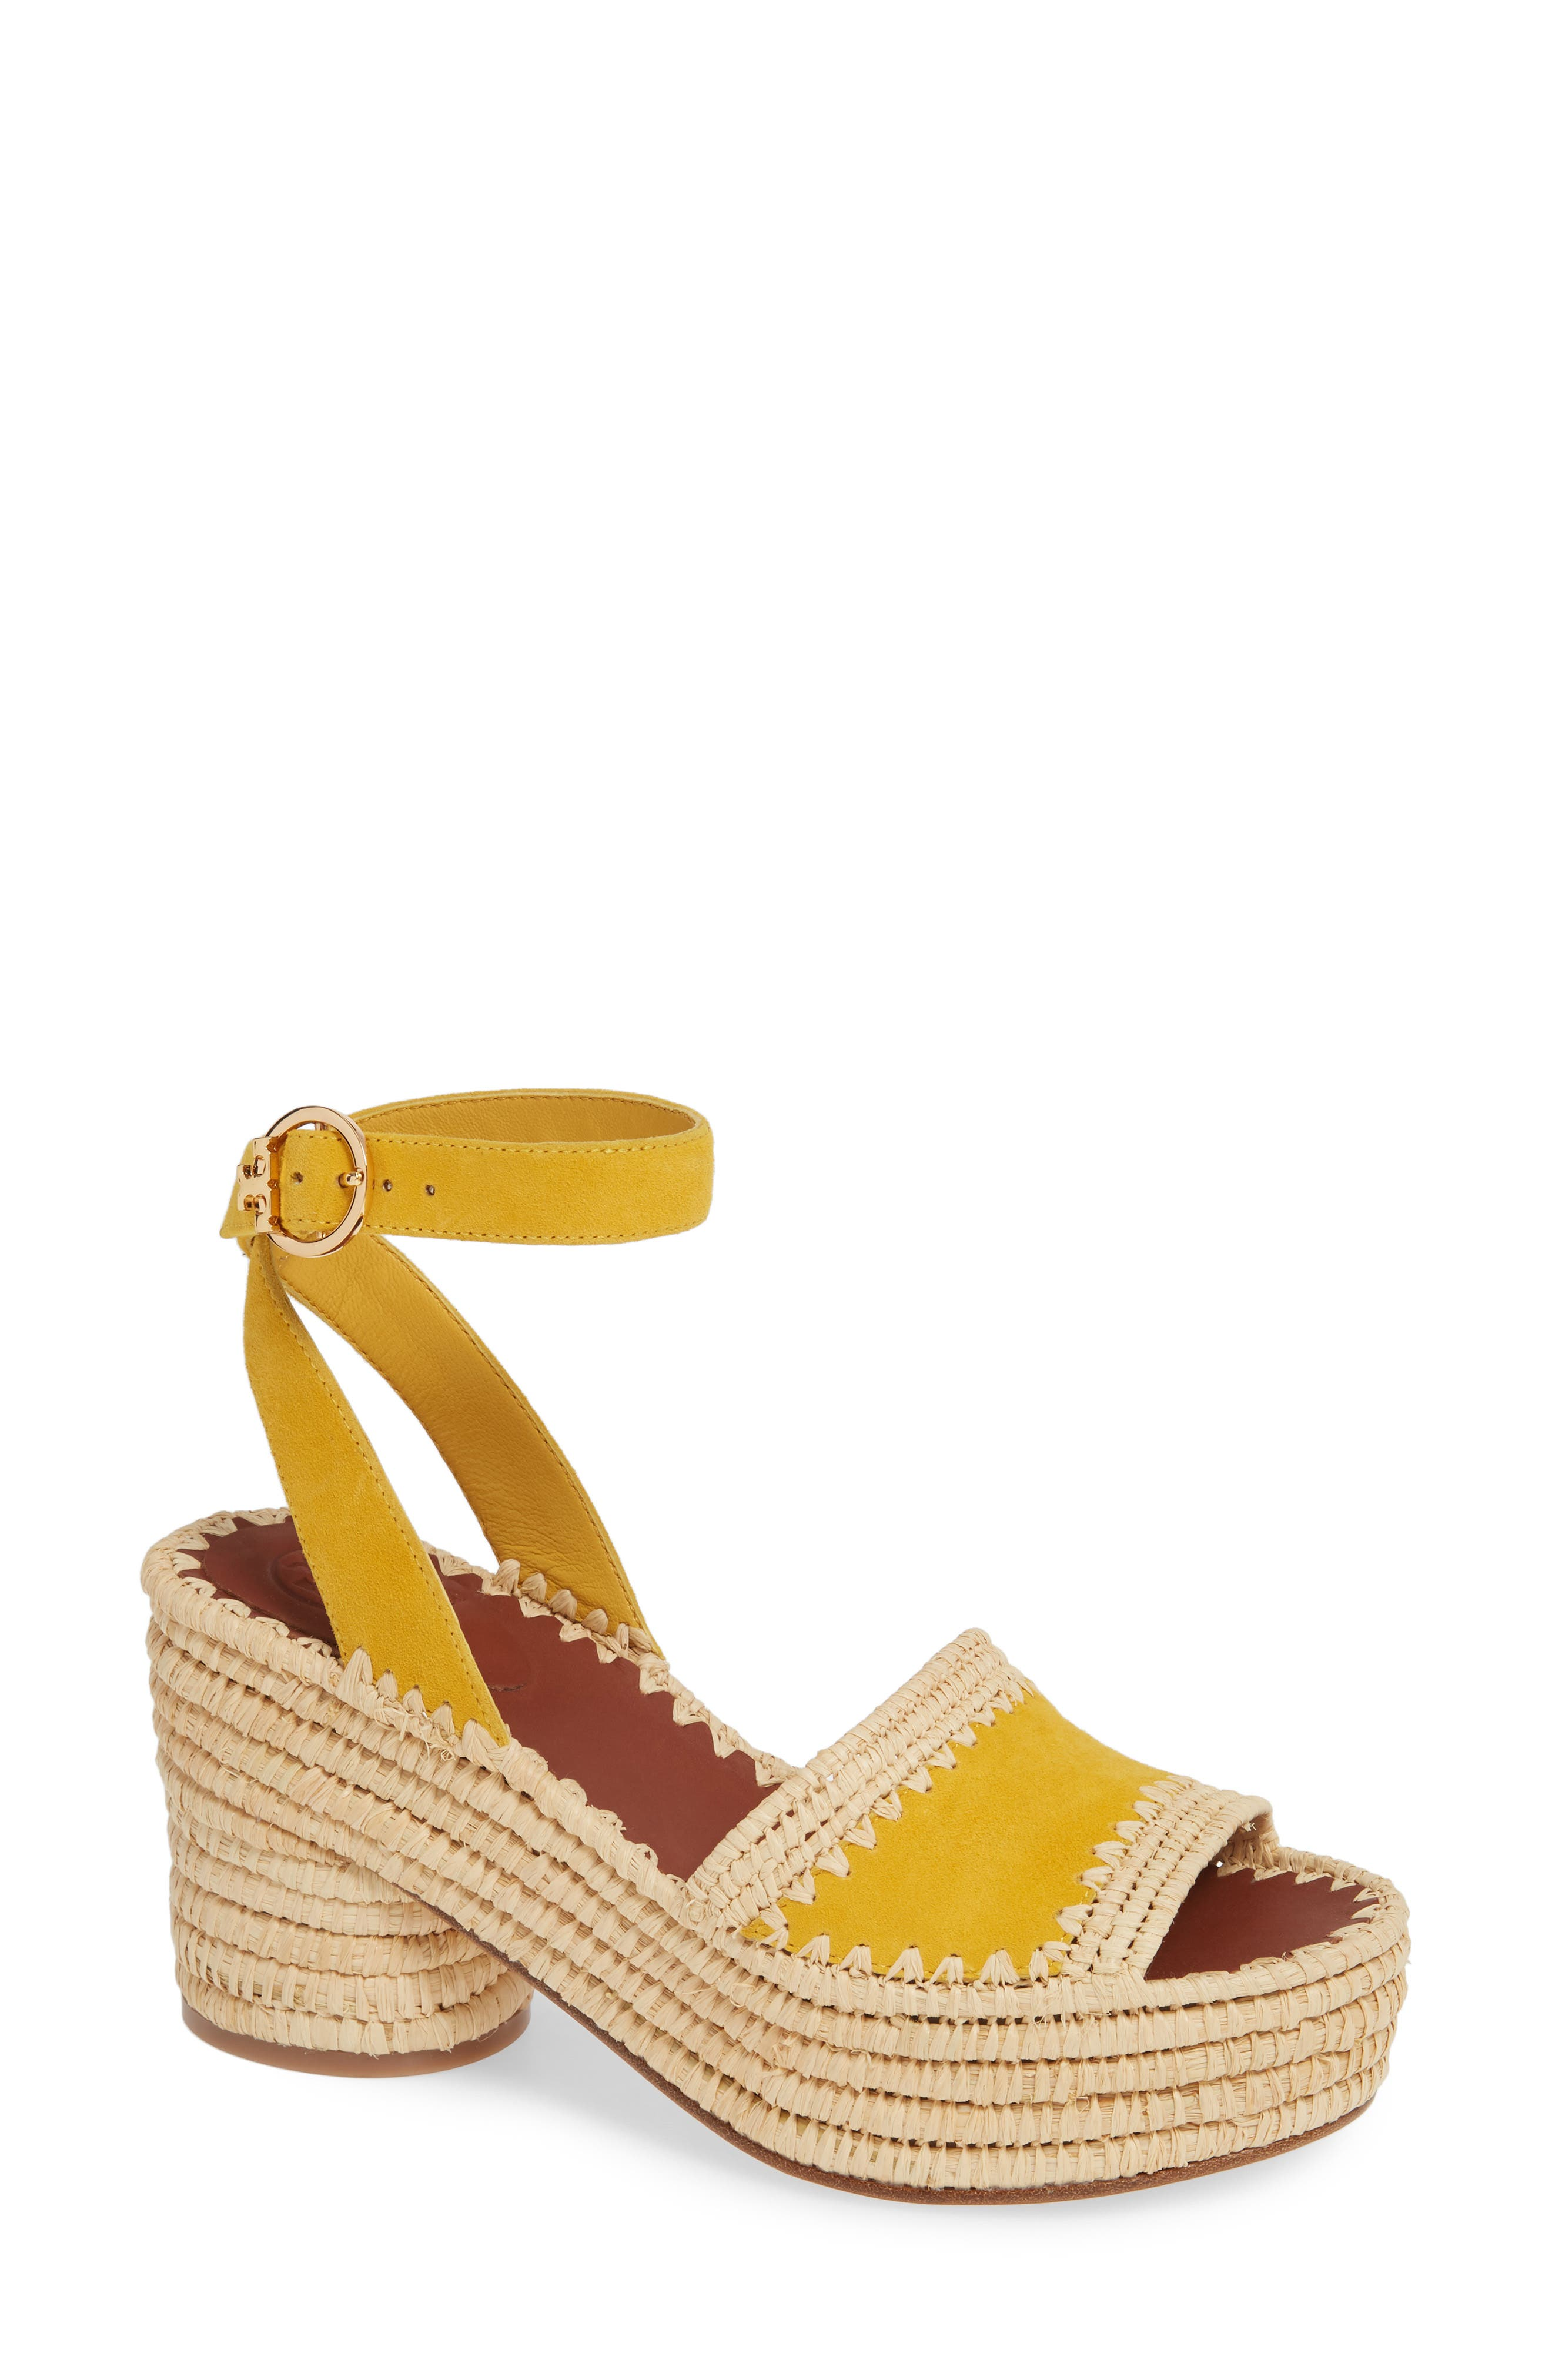 Tory Burch Arianne Platform Ankle Strap Sandal, Yellow